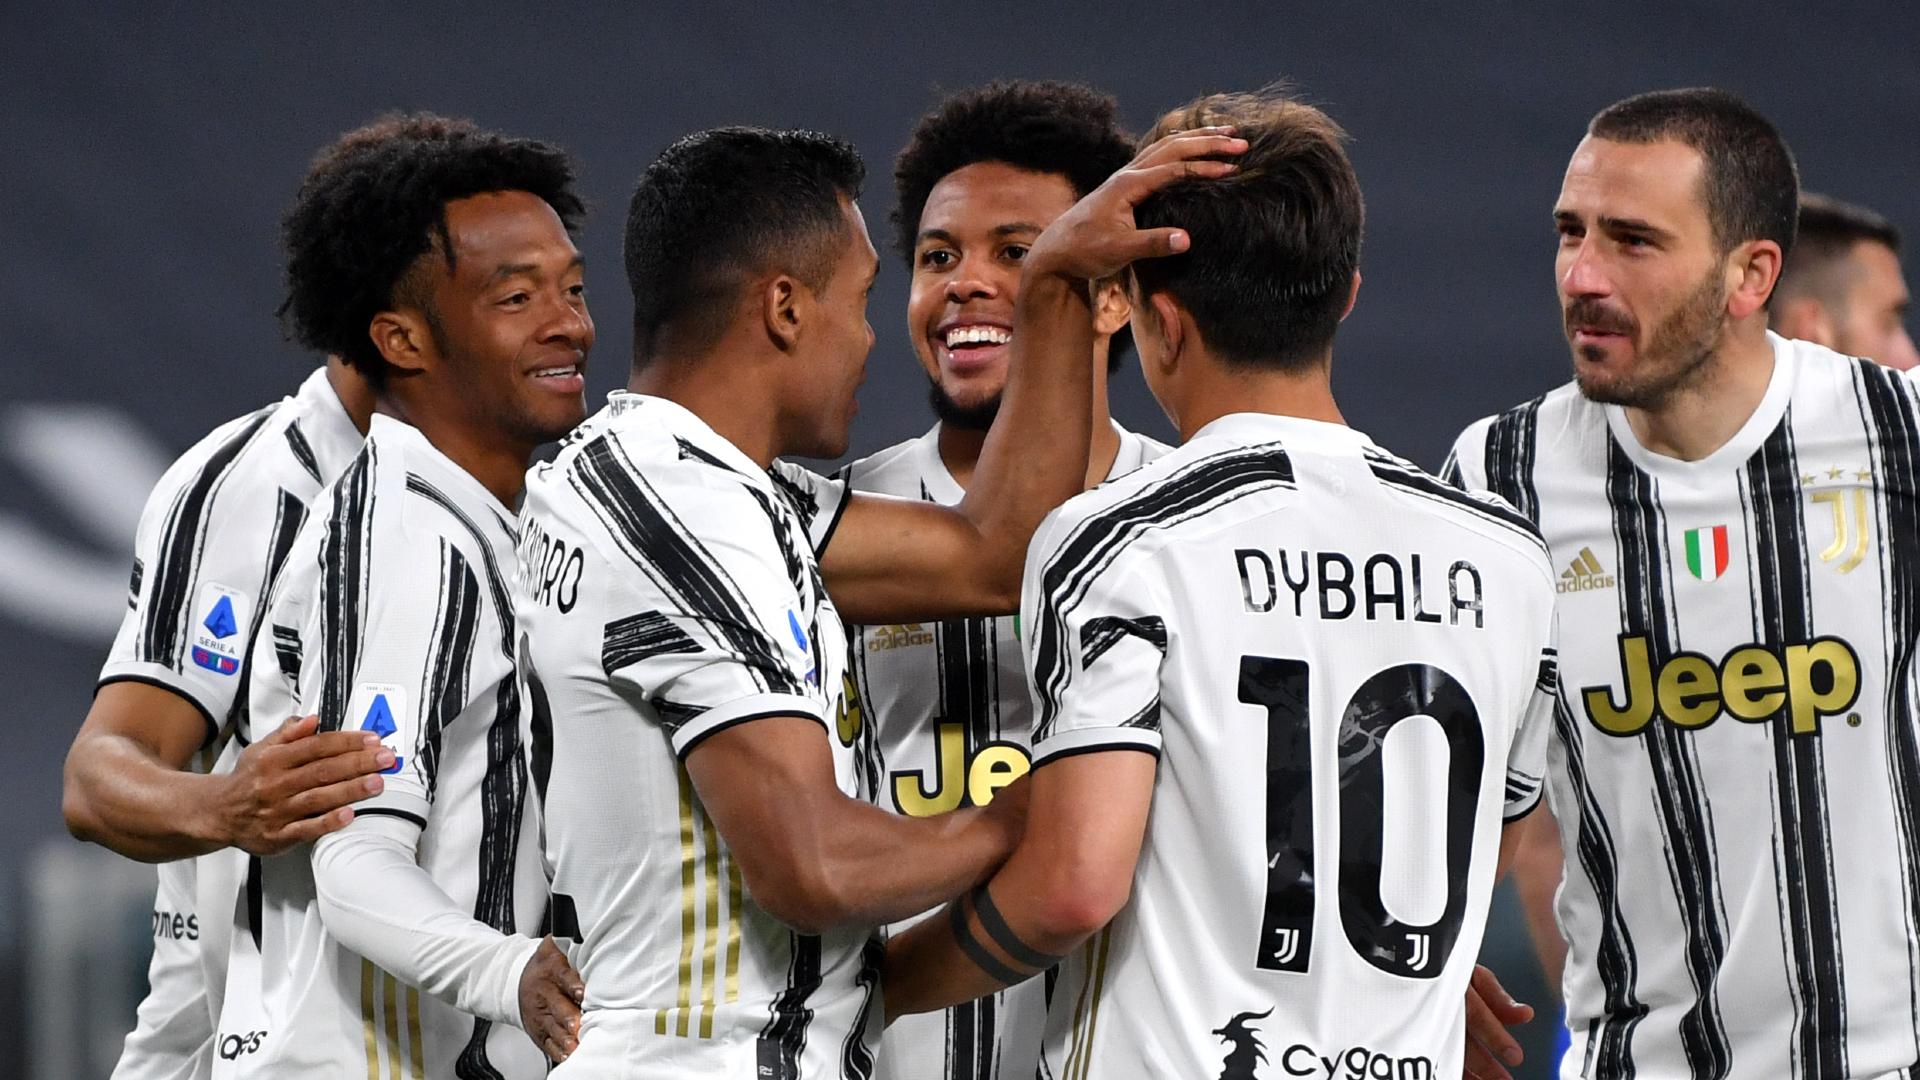 Juventus 3-1 Parma: Pirlo's men put Super League furore aside with comeback win